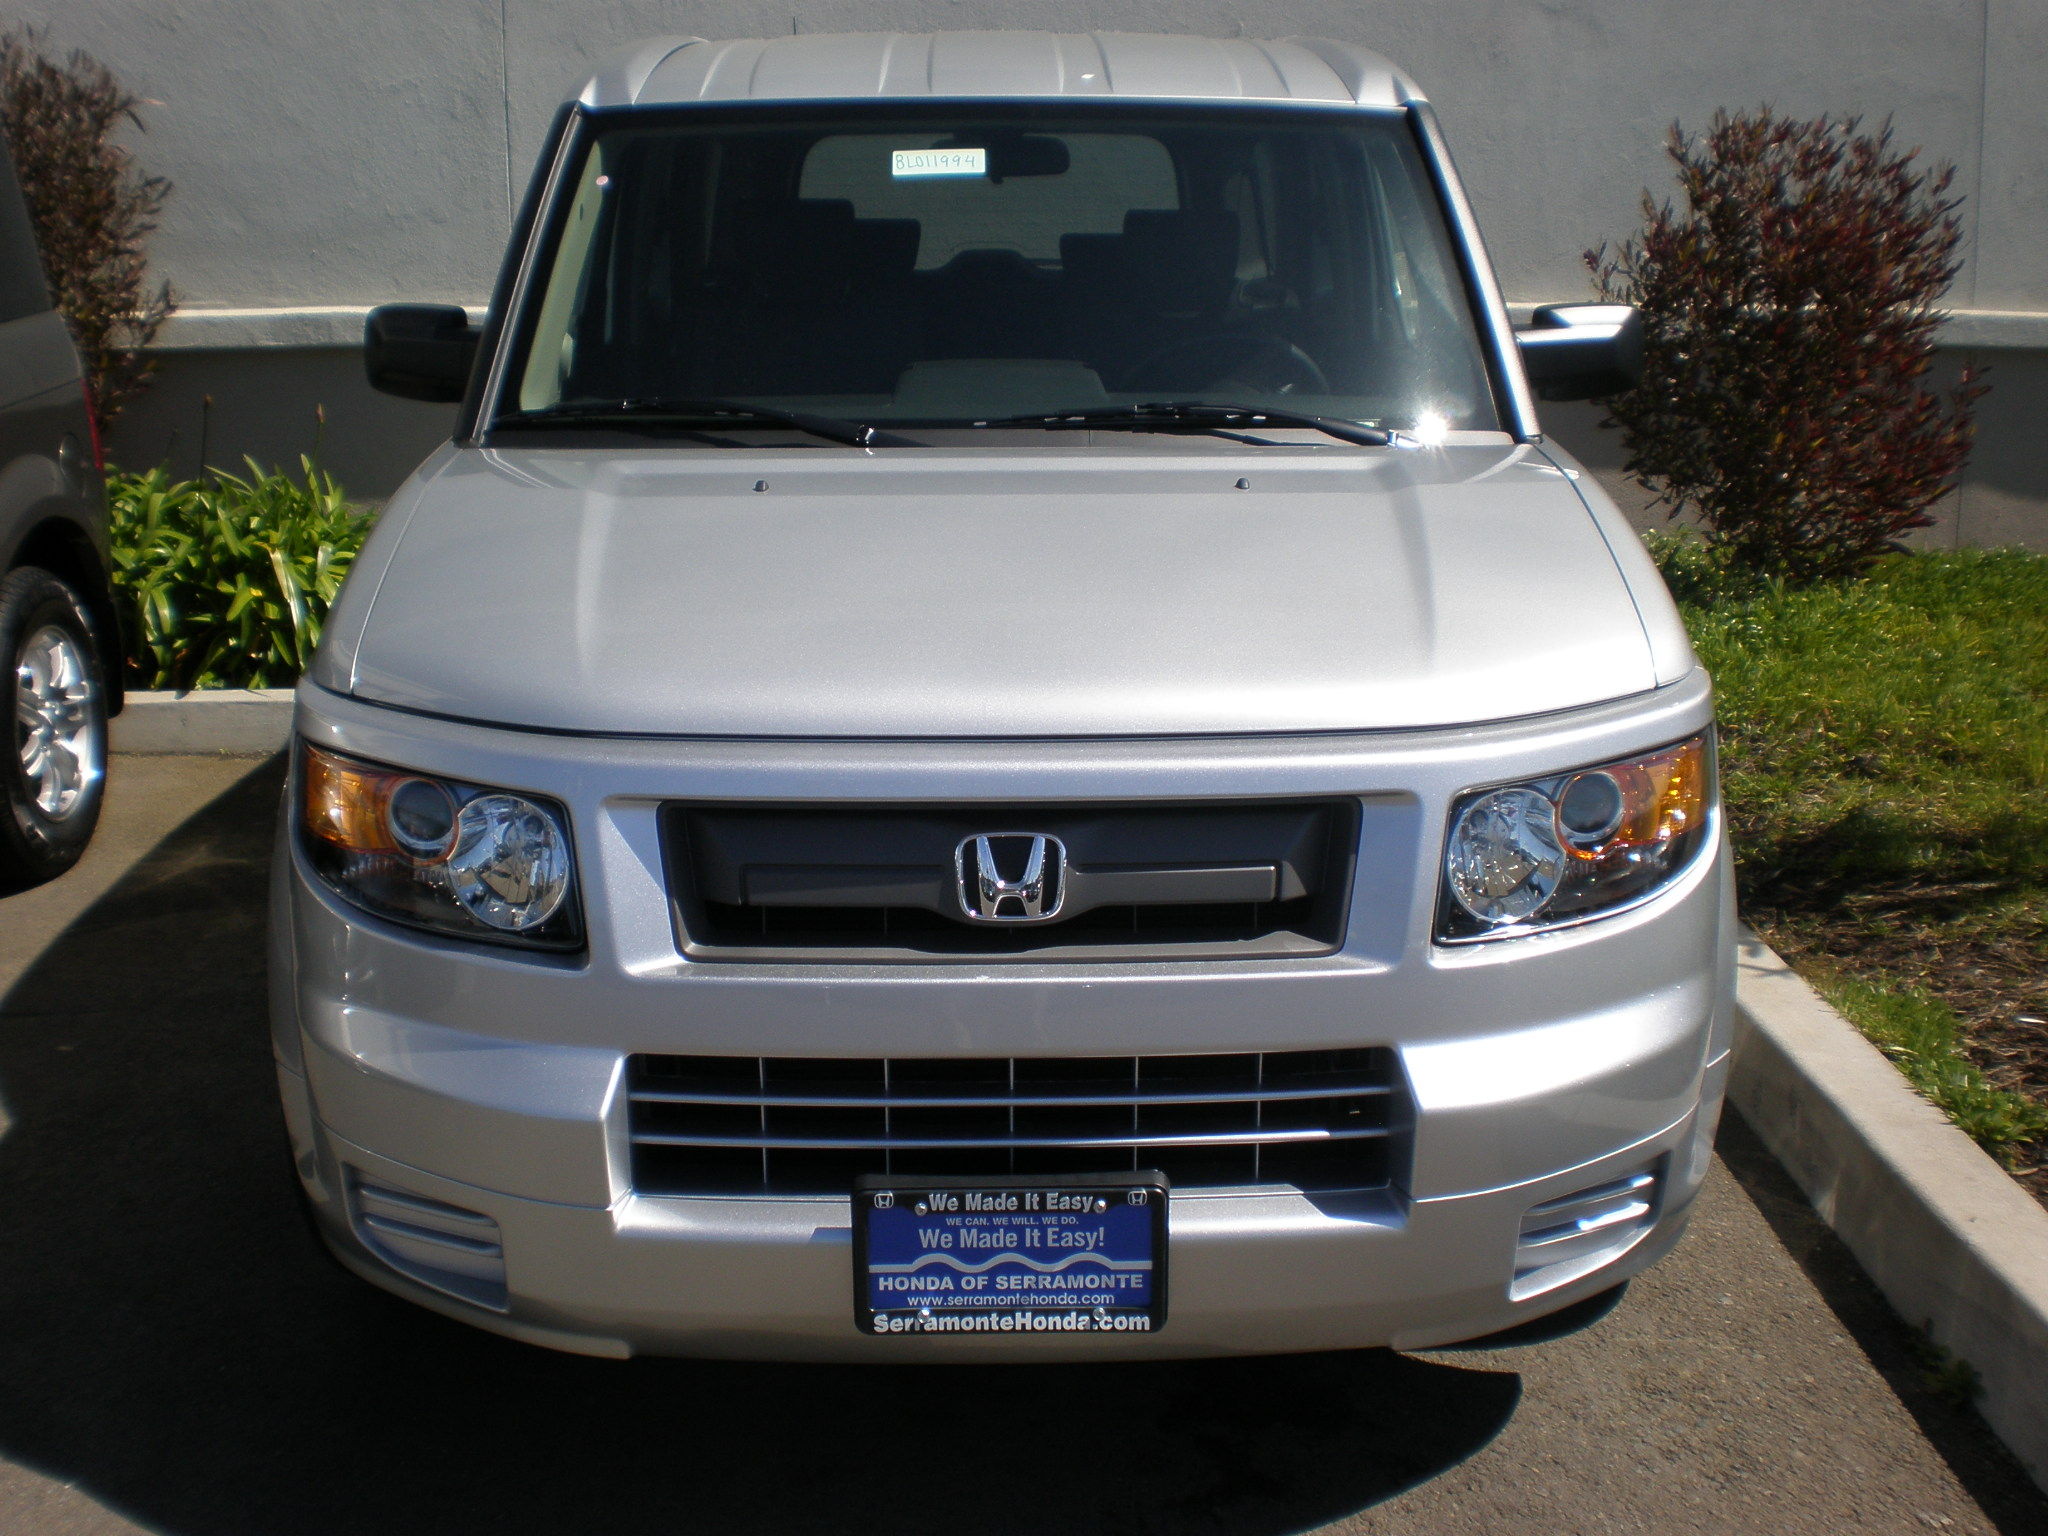 File:2008 silver Honda Element front.JPG